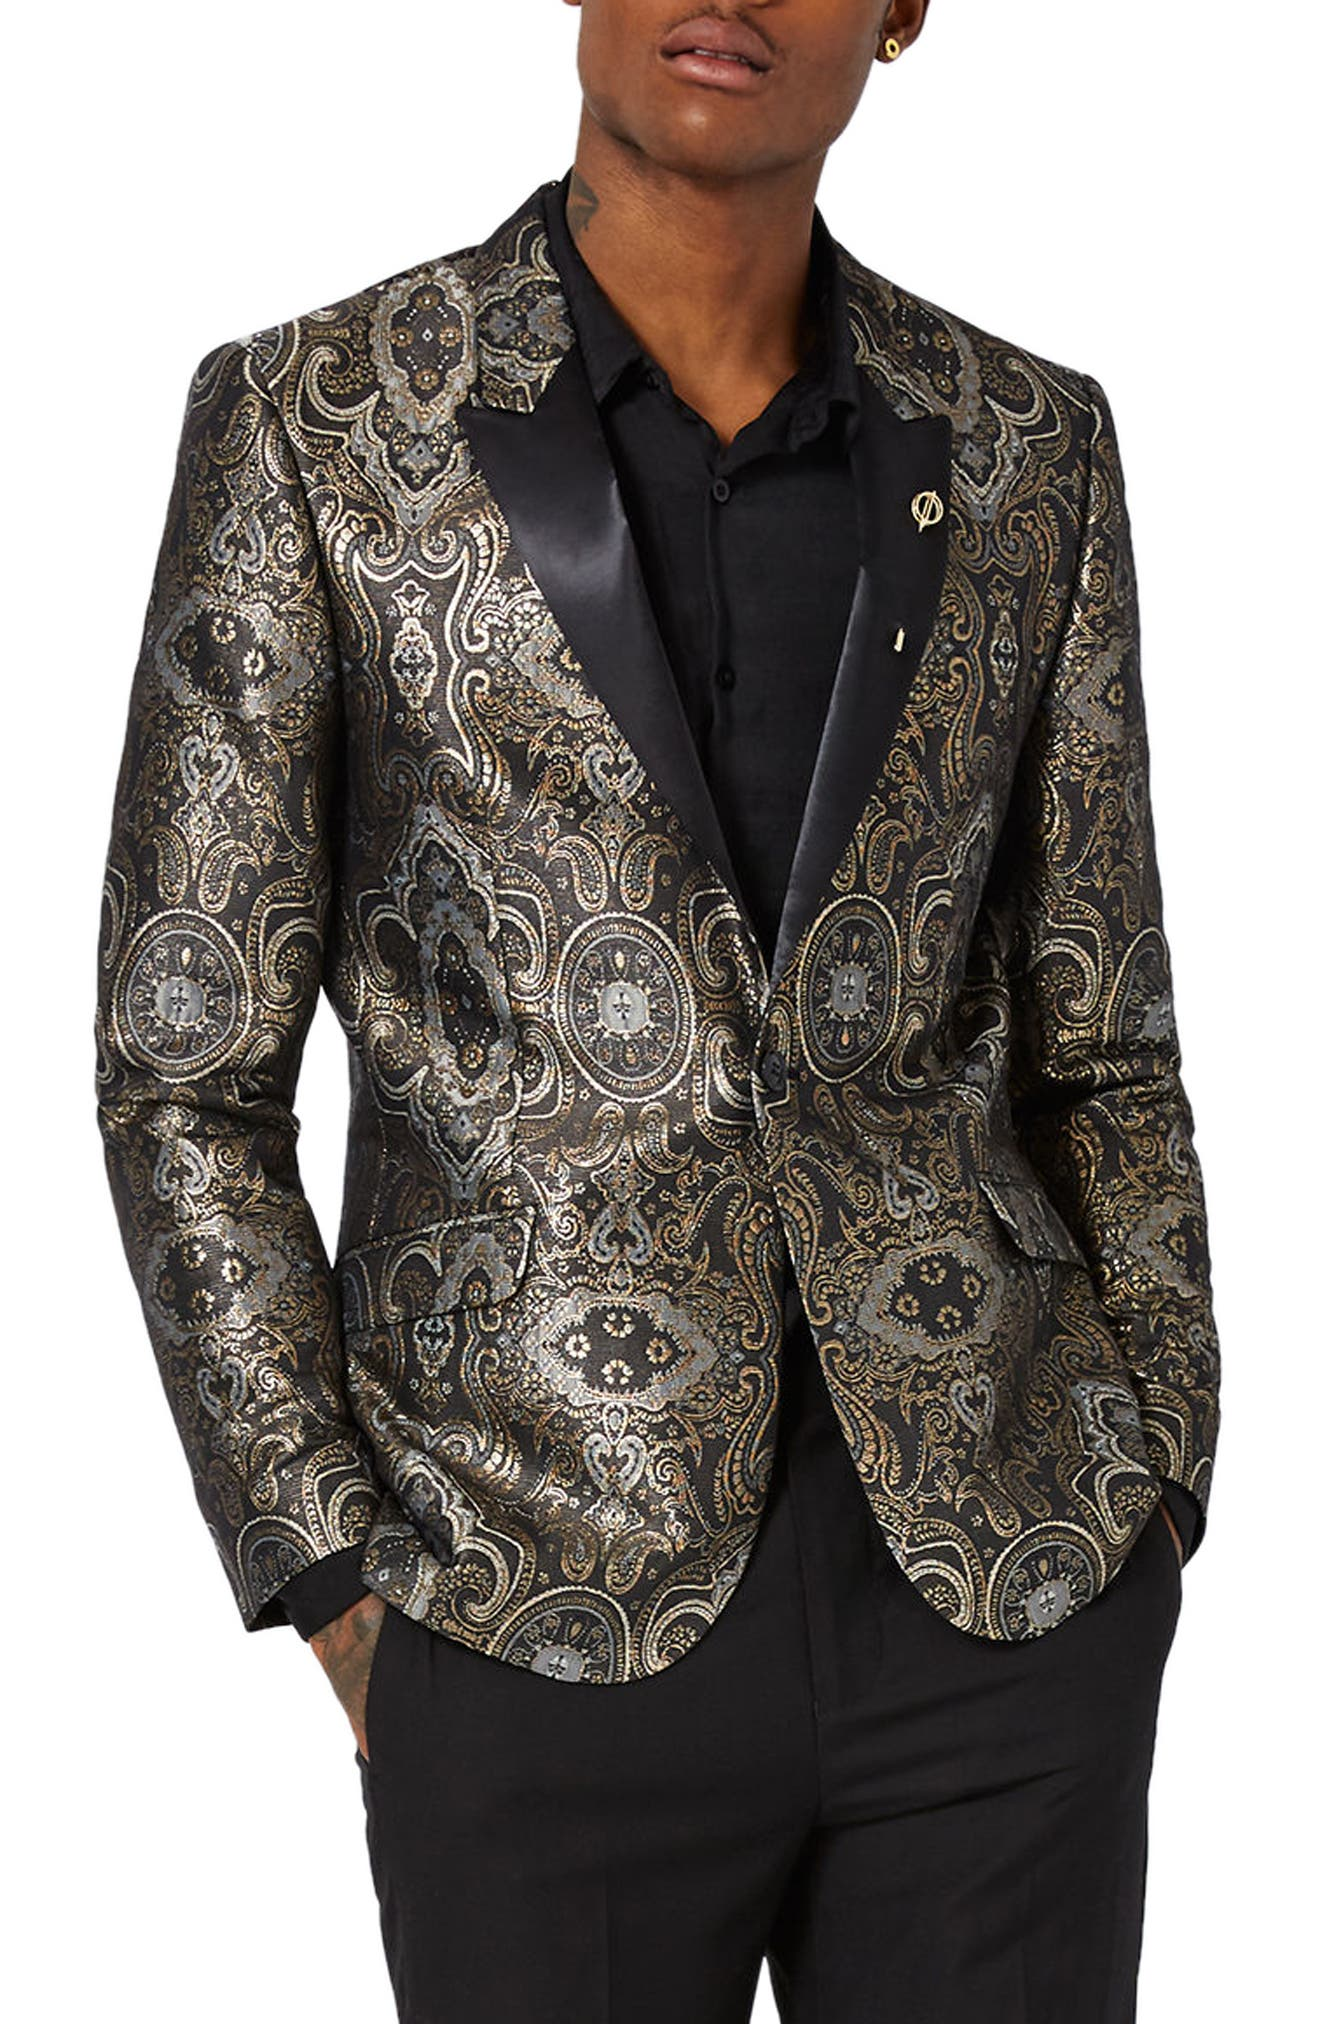 Topman Skinny Fit Paisley Tuxedo Jacket